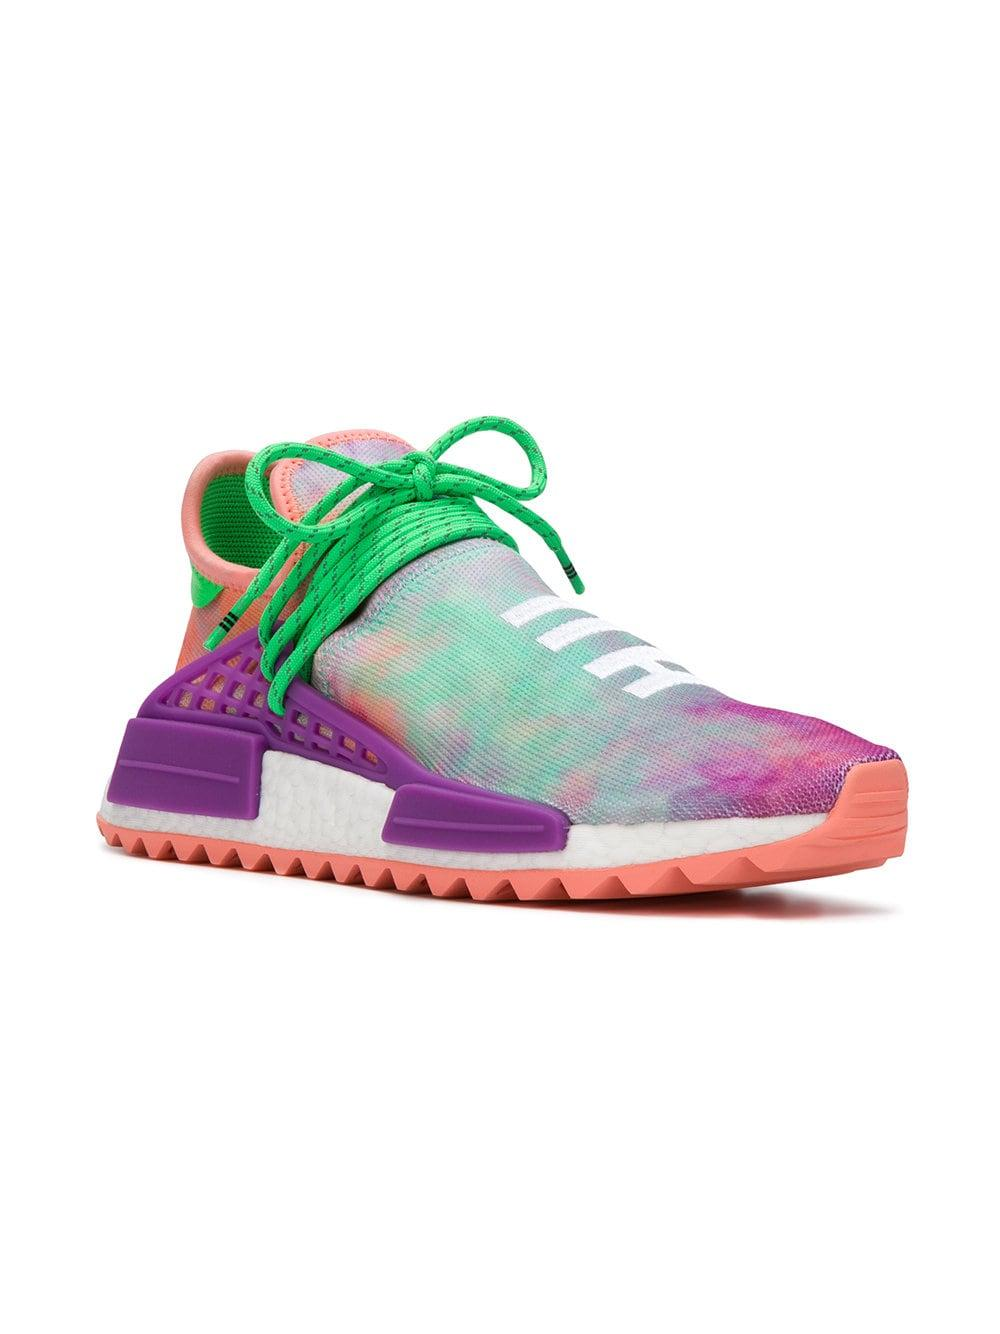 4e98157b1d7c2 Lyst - adidas Tie-dye Holi Hu Nmd Sneakers for Men